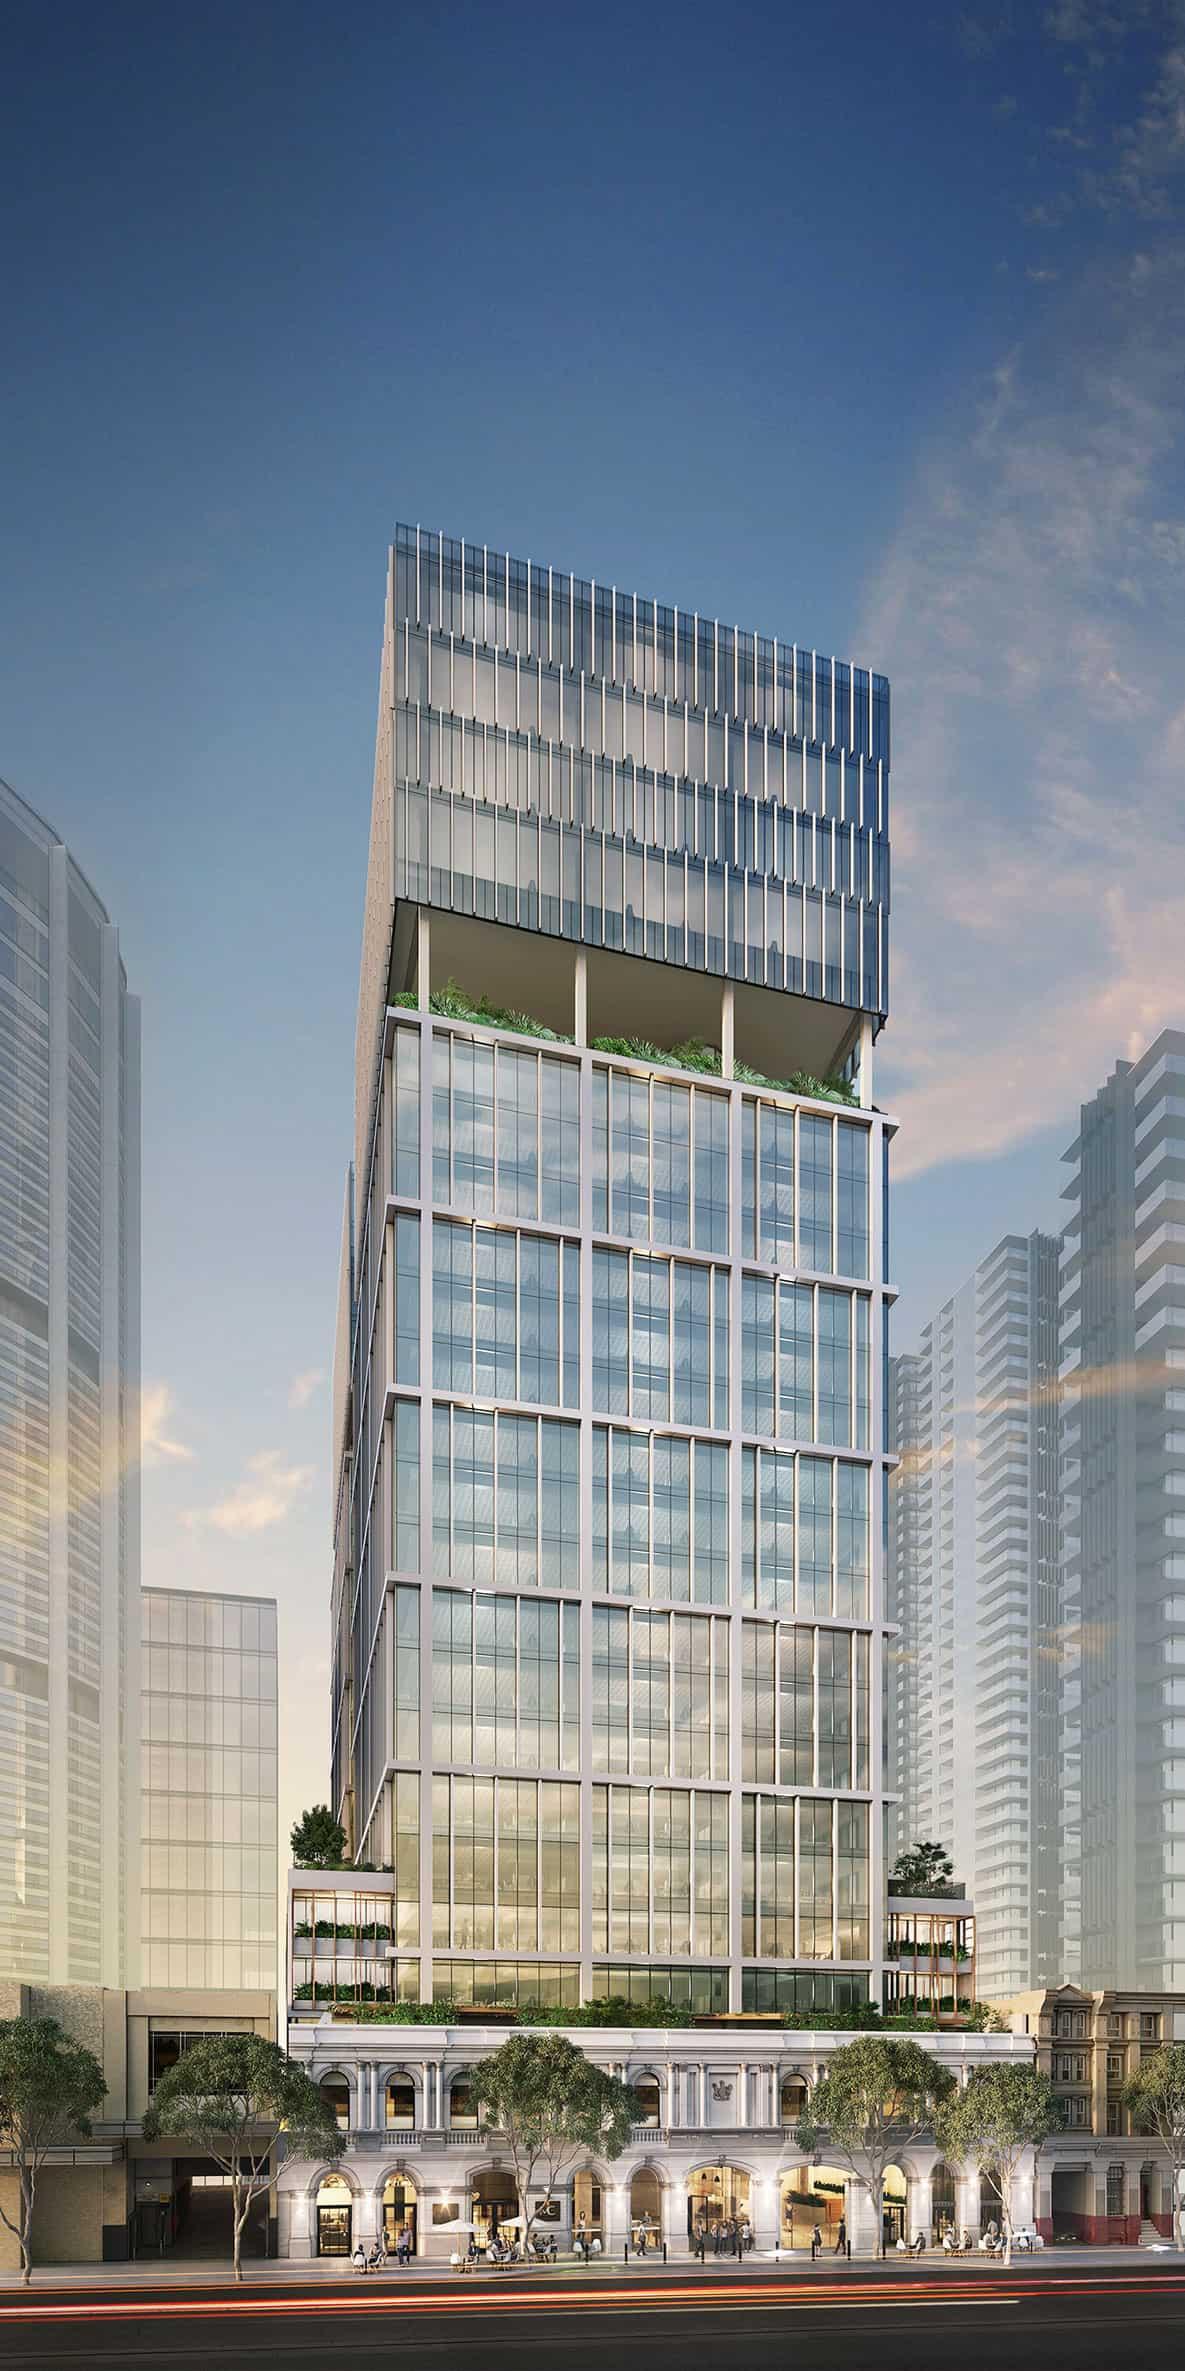 Midtown Centre - The Building